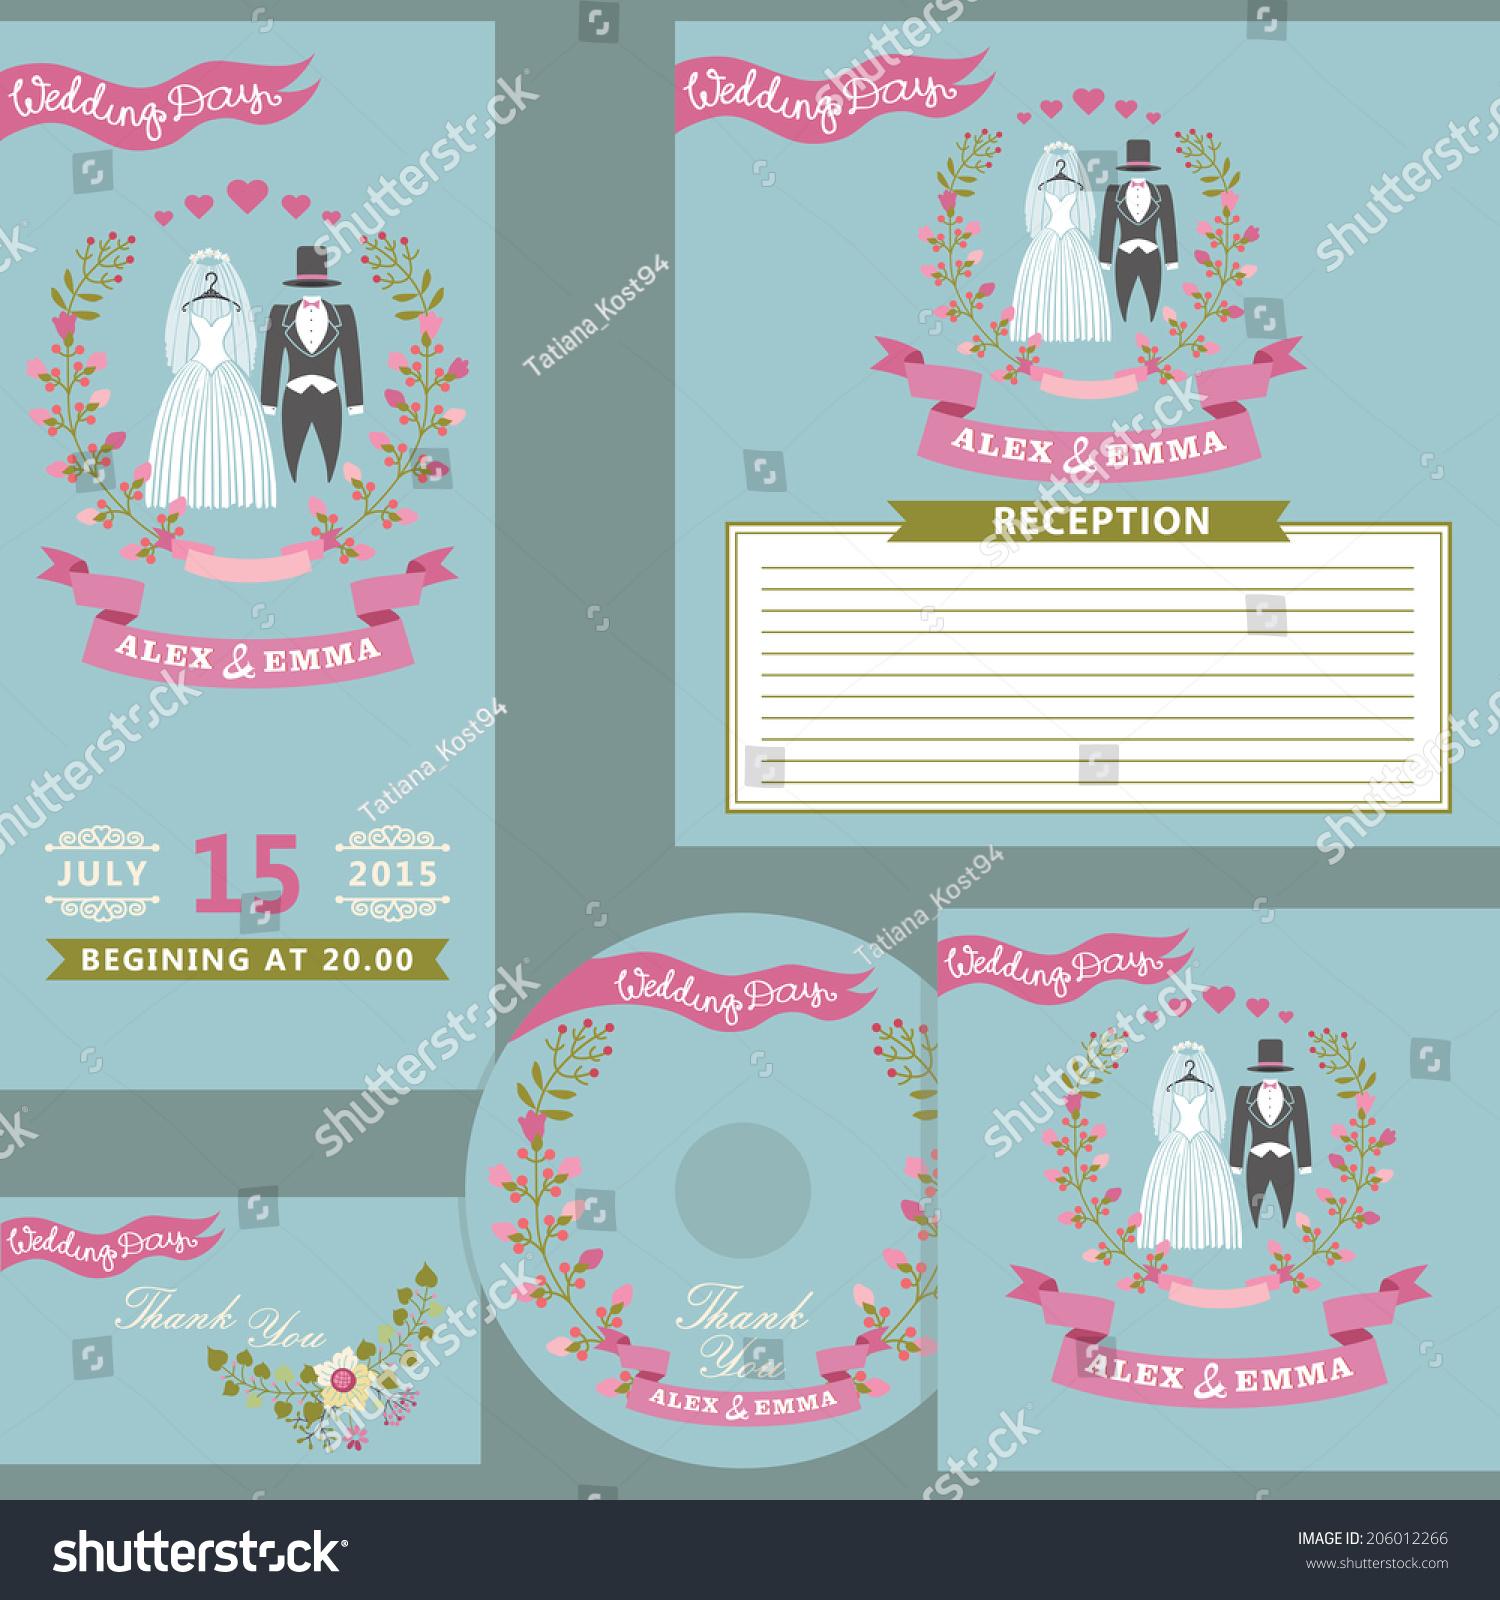 Vintage Wedding Invitation Design Template Set Stock Vector ...